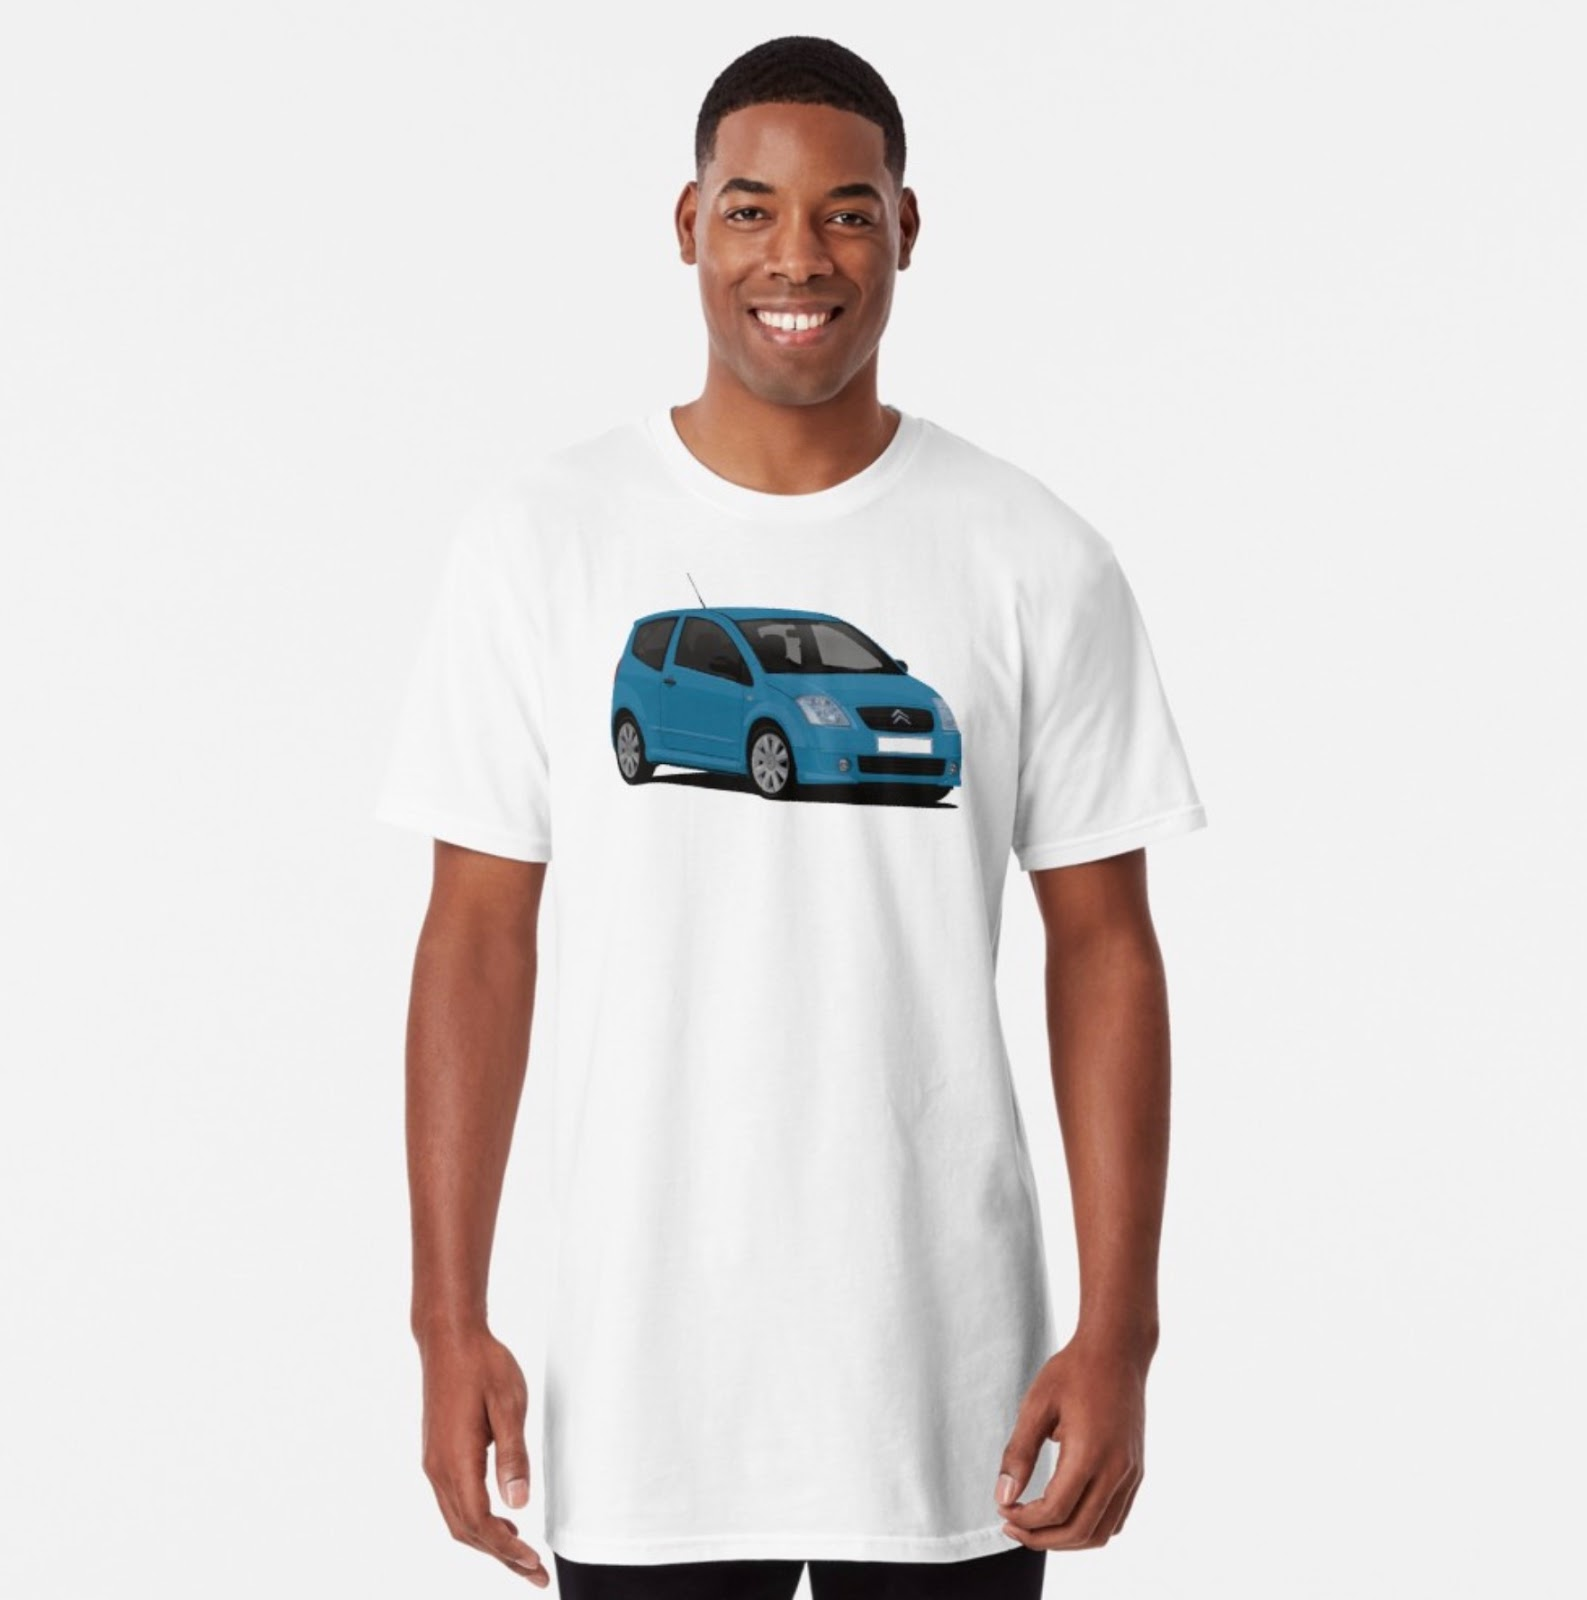 CItroën C2 VTR / VTS T-shirt | Classic, vintage and